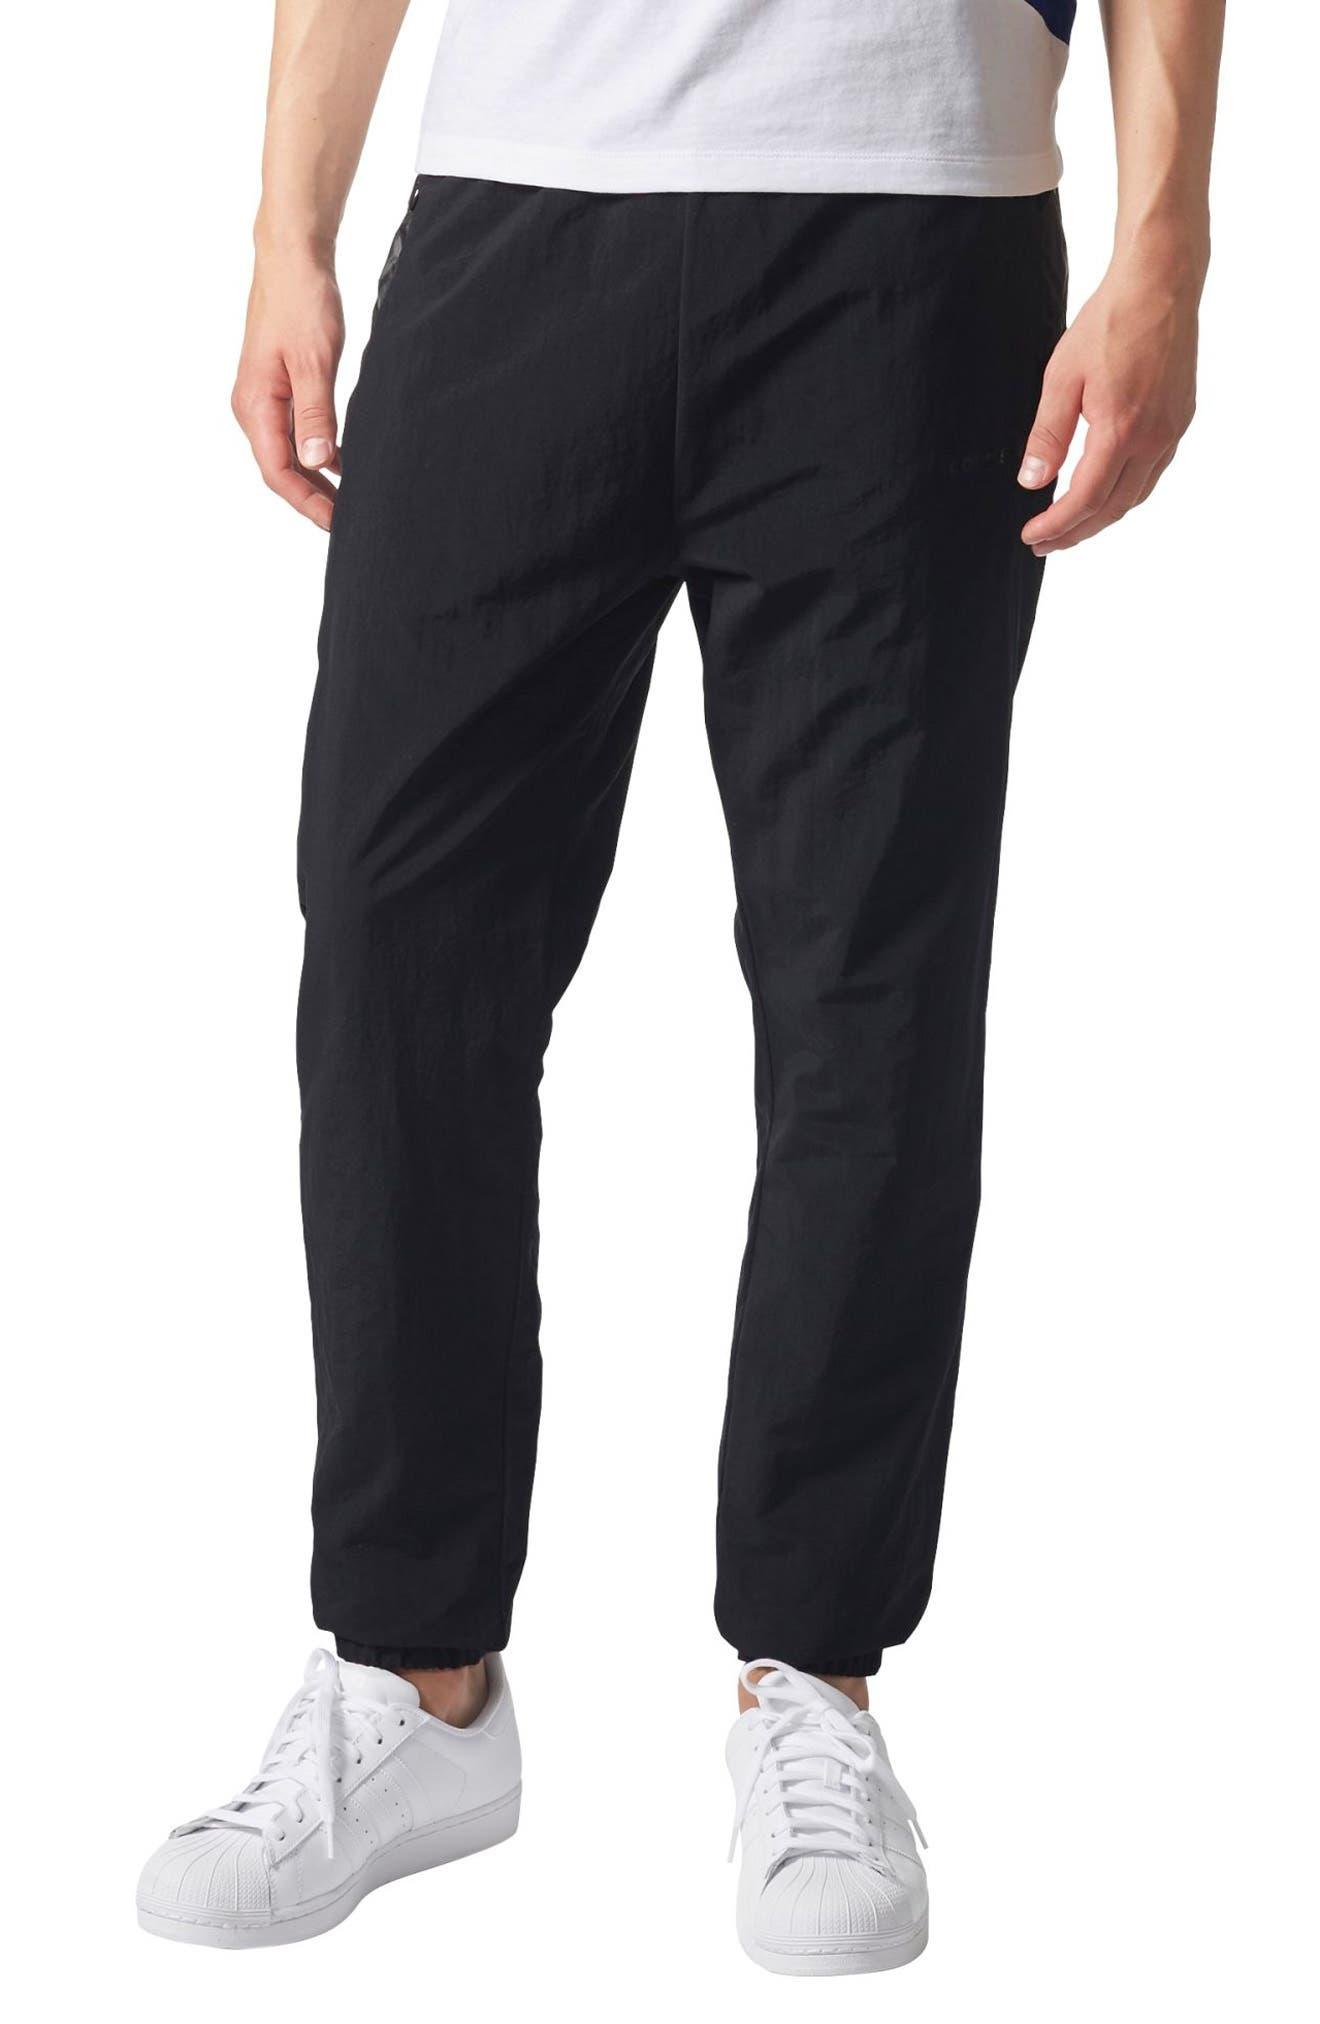 Main Image - adidas Originals Slim Tapered Pants